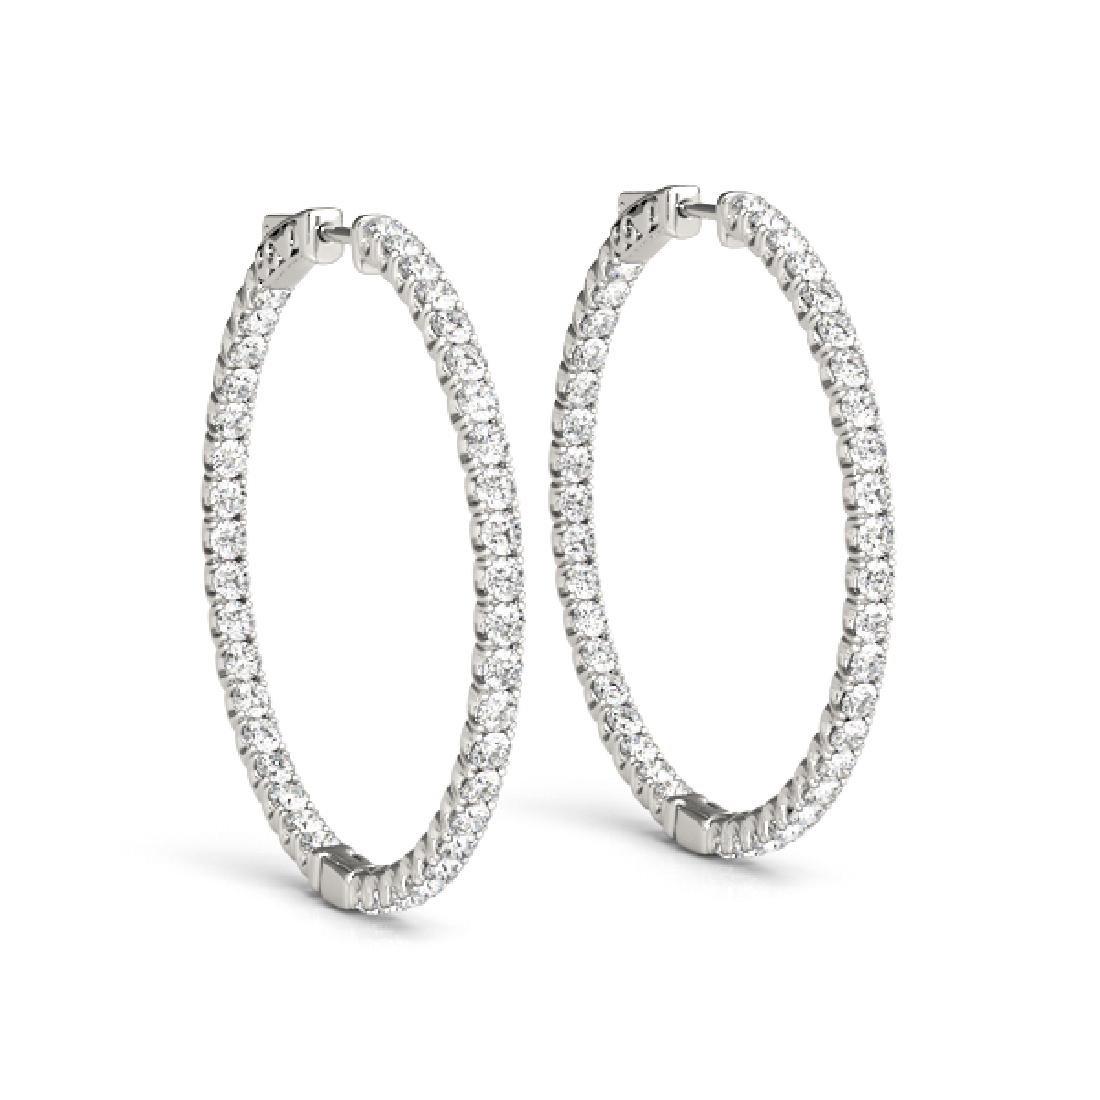 1.5 CTW Diamond VS/SI Certified 21 Mm Hoop Earrings 14K - 2